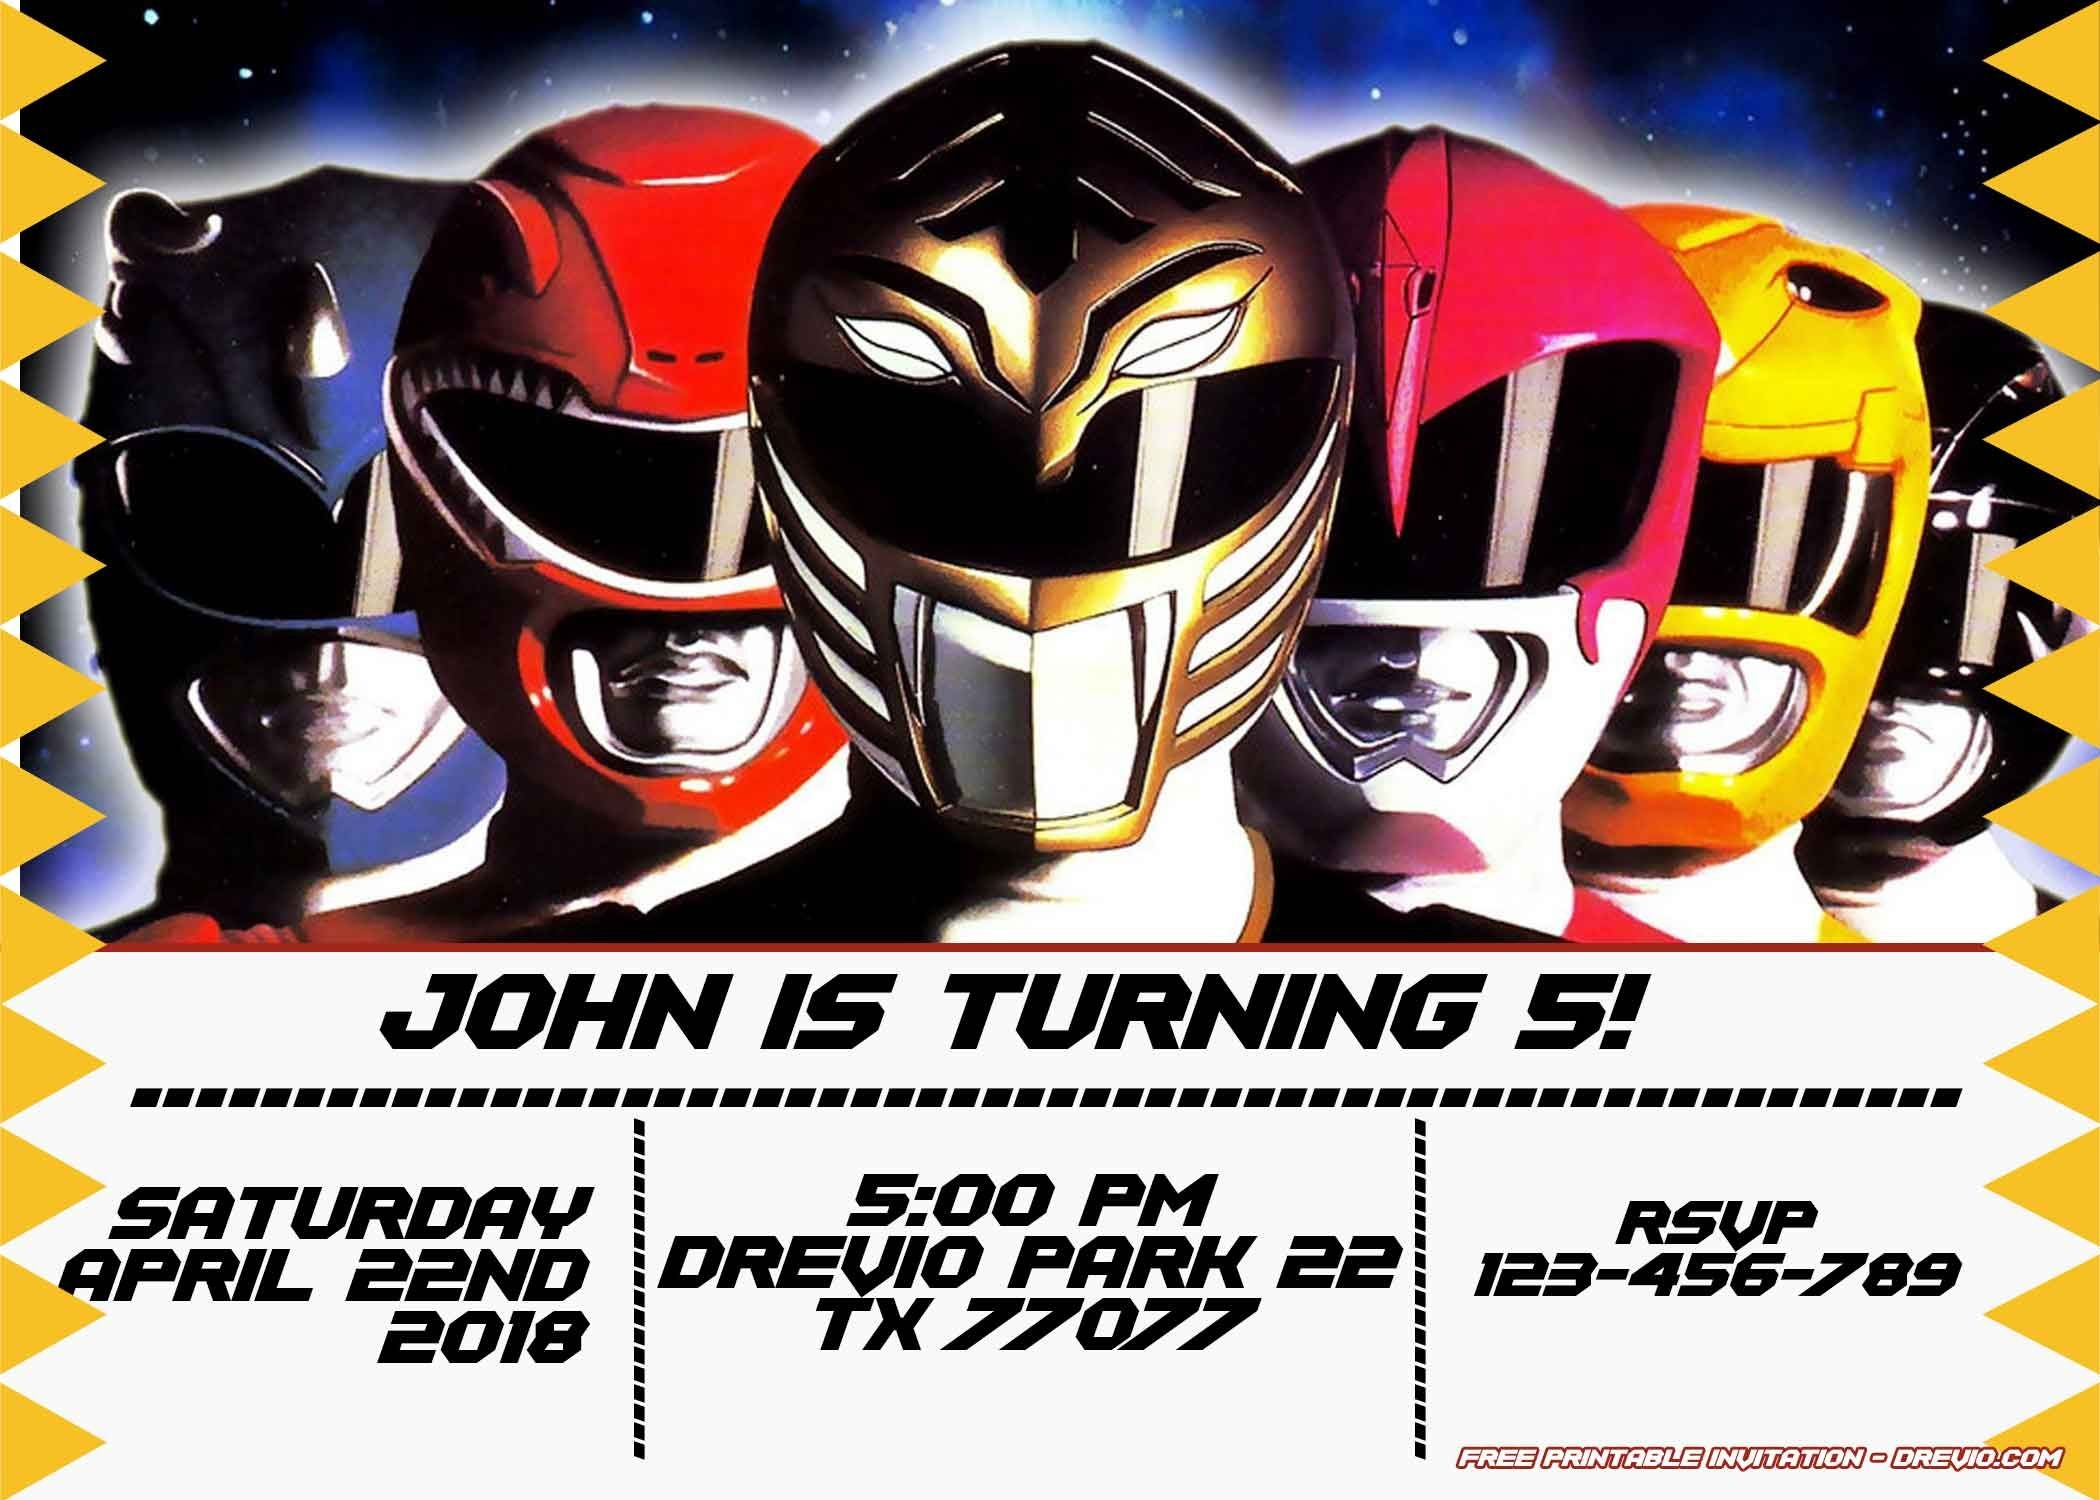 Free Power Rangers Birthday Invitation | Life's A Party | Power - Free Printable Power Ranger Birthday Invitations